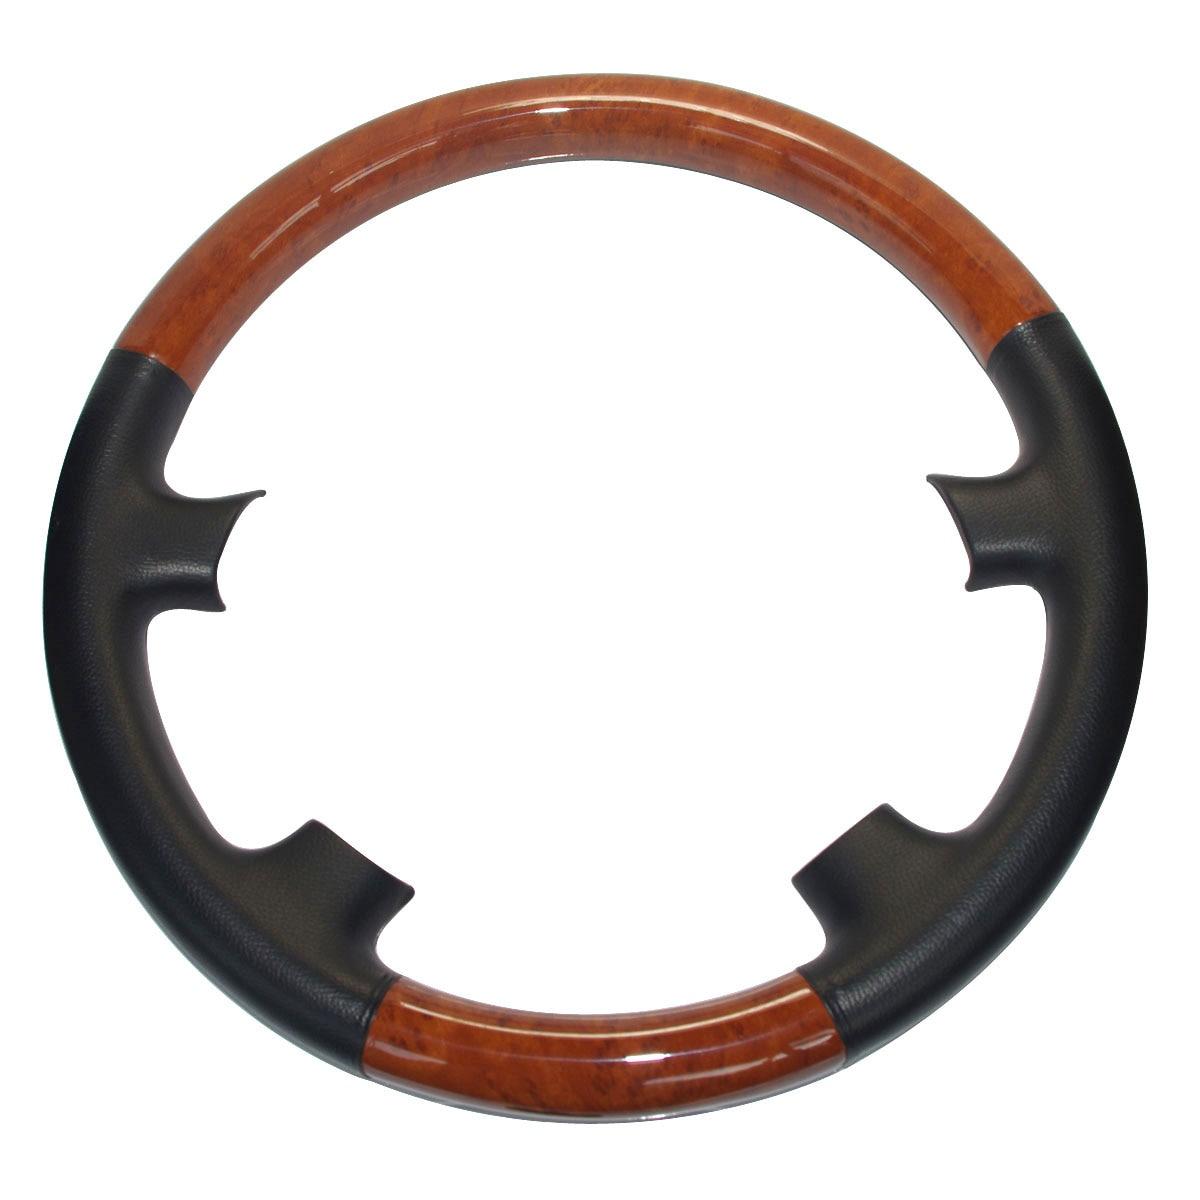 Leather Brown Wood Steering Wheel Cover Protector For 2003-2007 Toyota Land Cruiser FJ100 4700 Prado FJ120 Lexus LX470 GX470